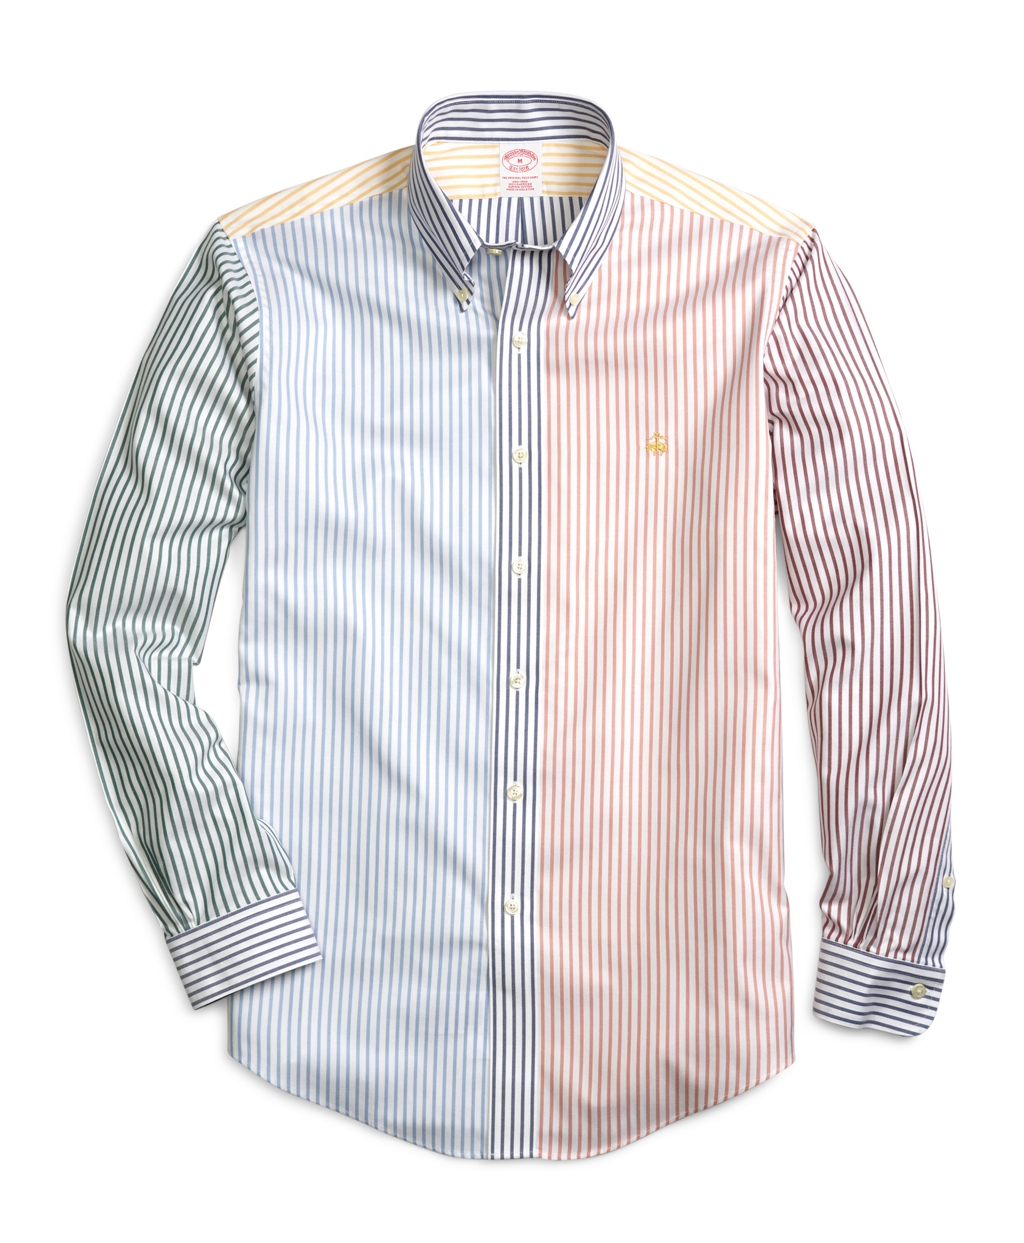 Brooks brothers non iron slim fit multi stripe sport shirt for Brooks brothers sports shirts